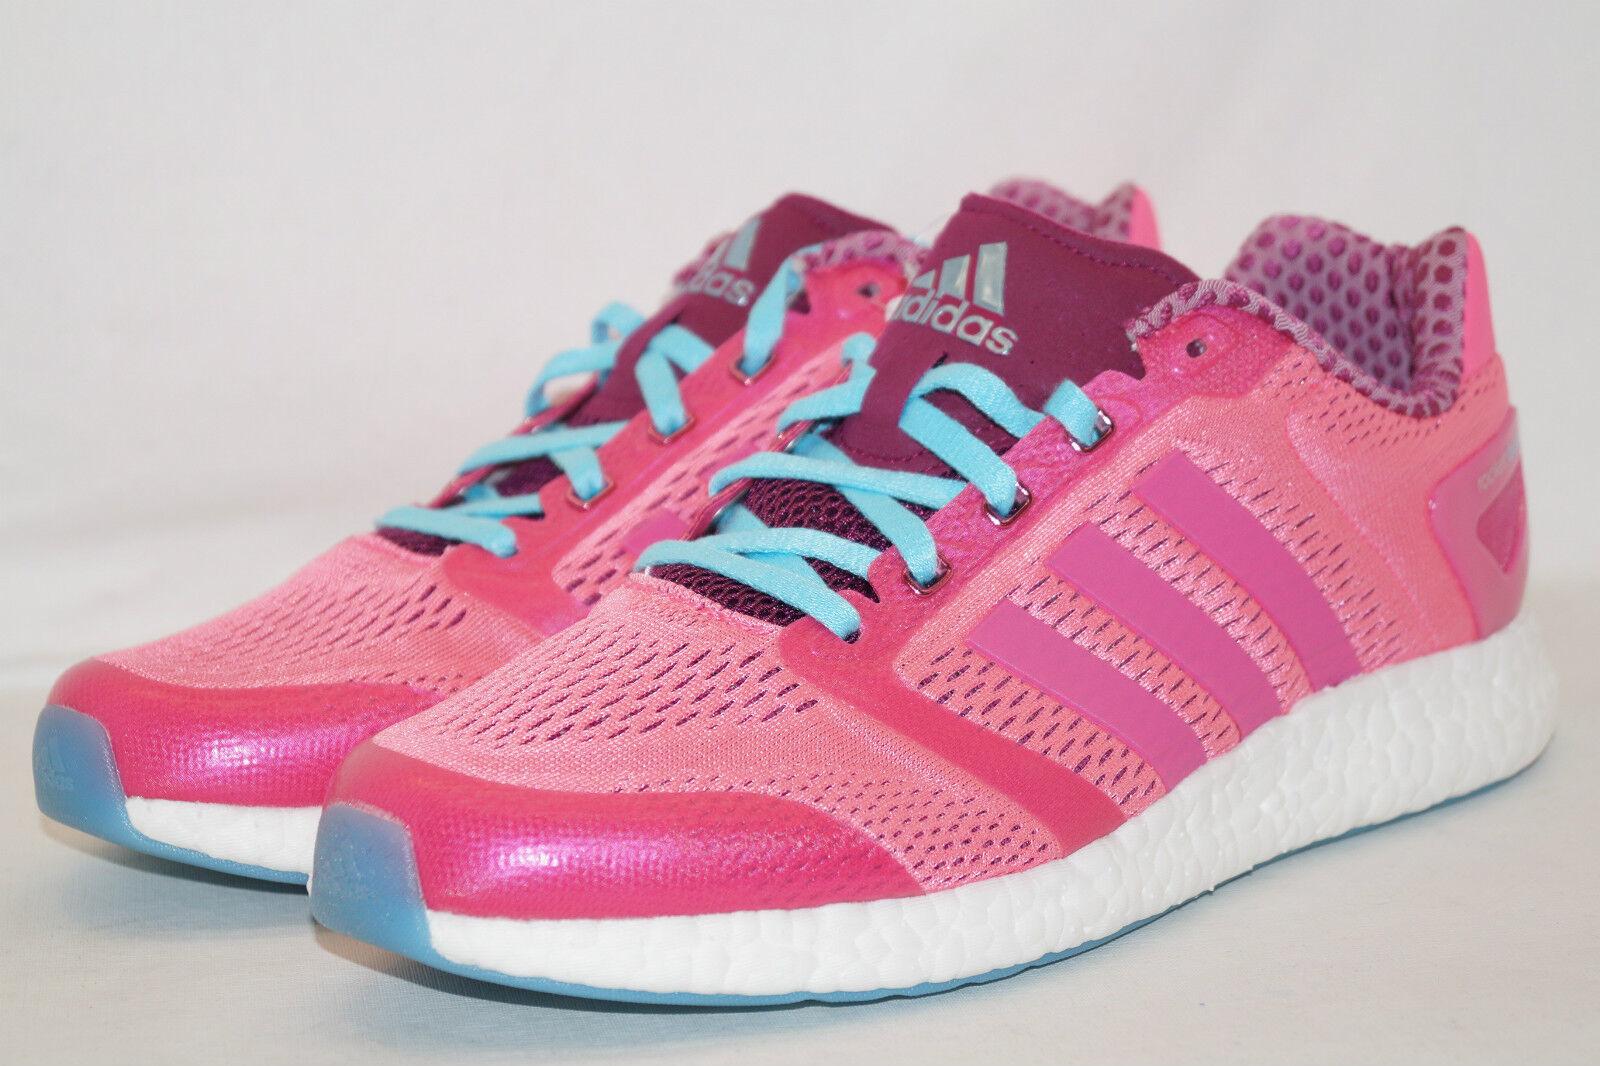 Adidas CC rocket boost w climachill Lauf Sport Schuhe 42 UK 8,0 rosa pink